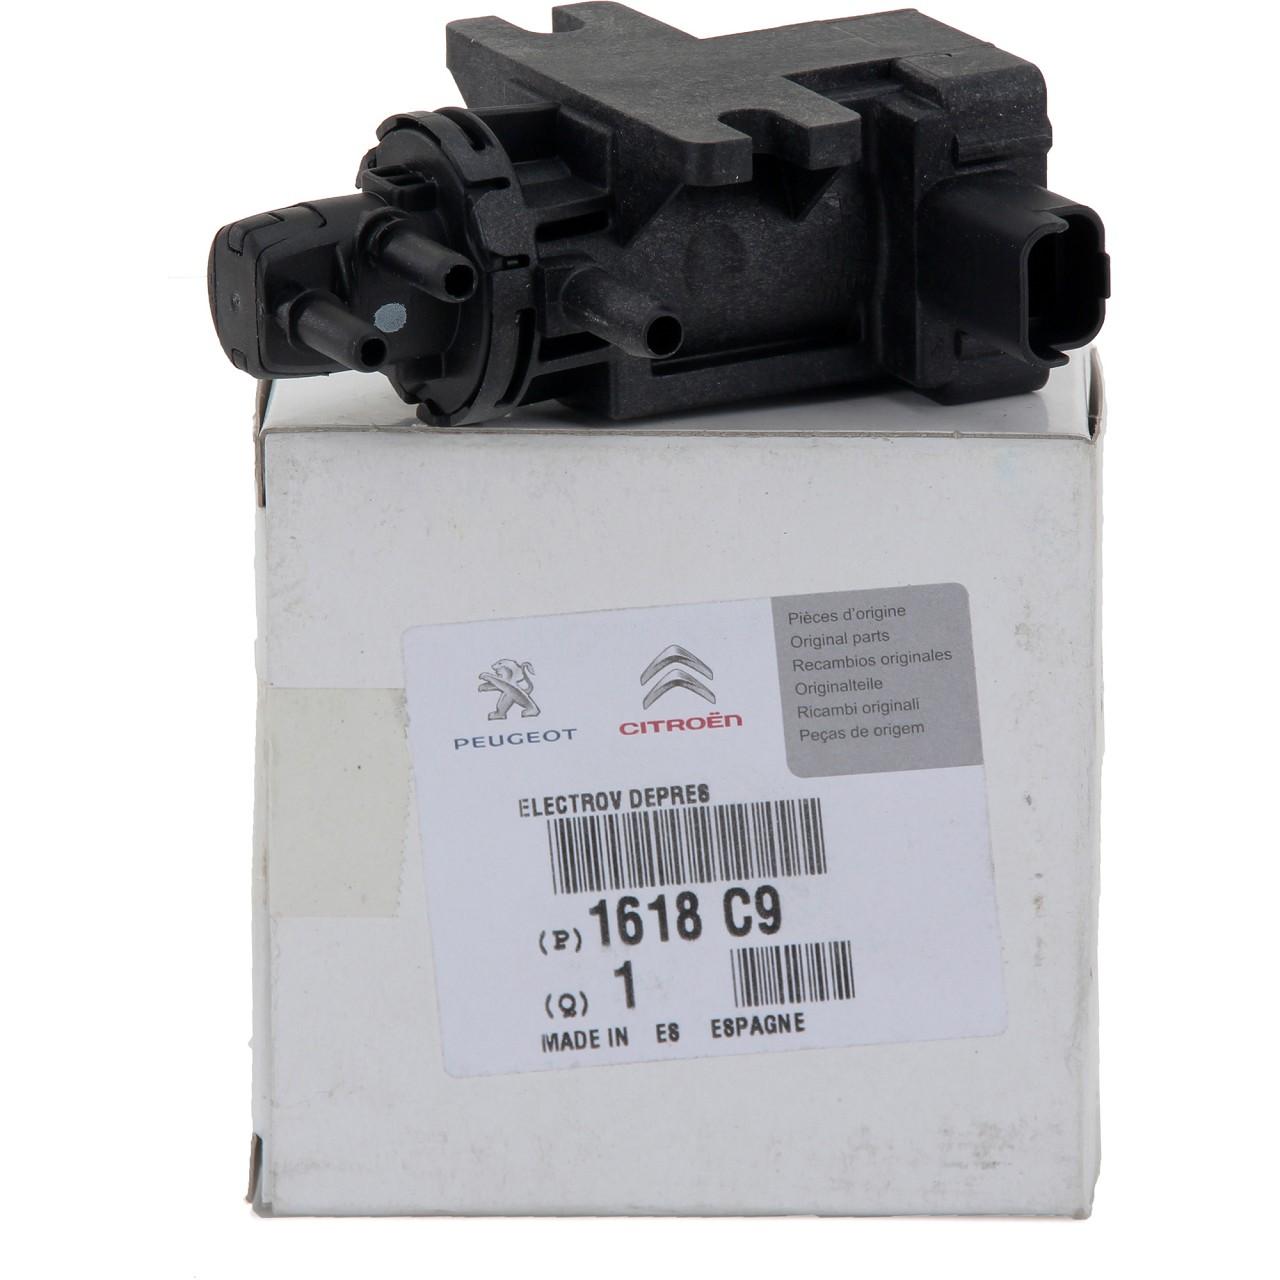 ORIGINAL Citroen Peugeot Druckwandler Magnetventil Elektroventil HDi 1618.C9